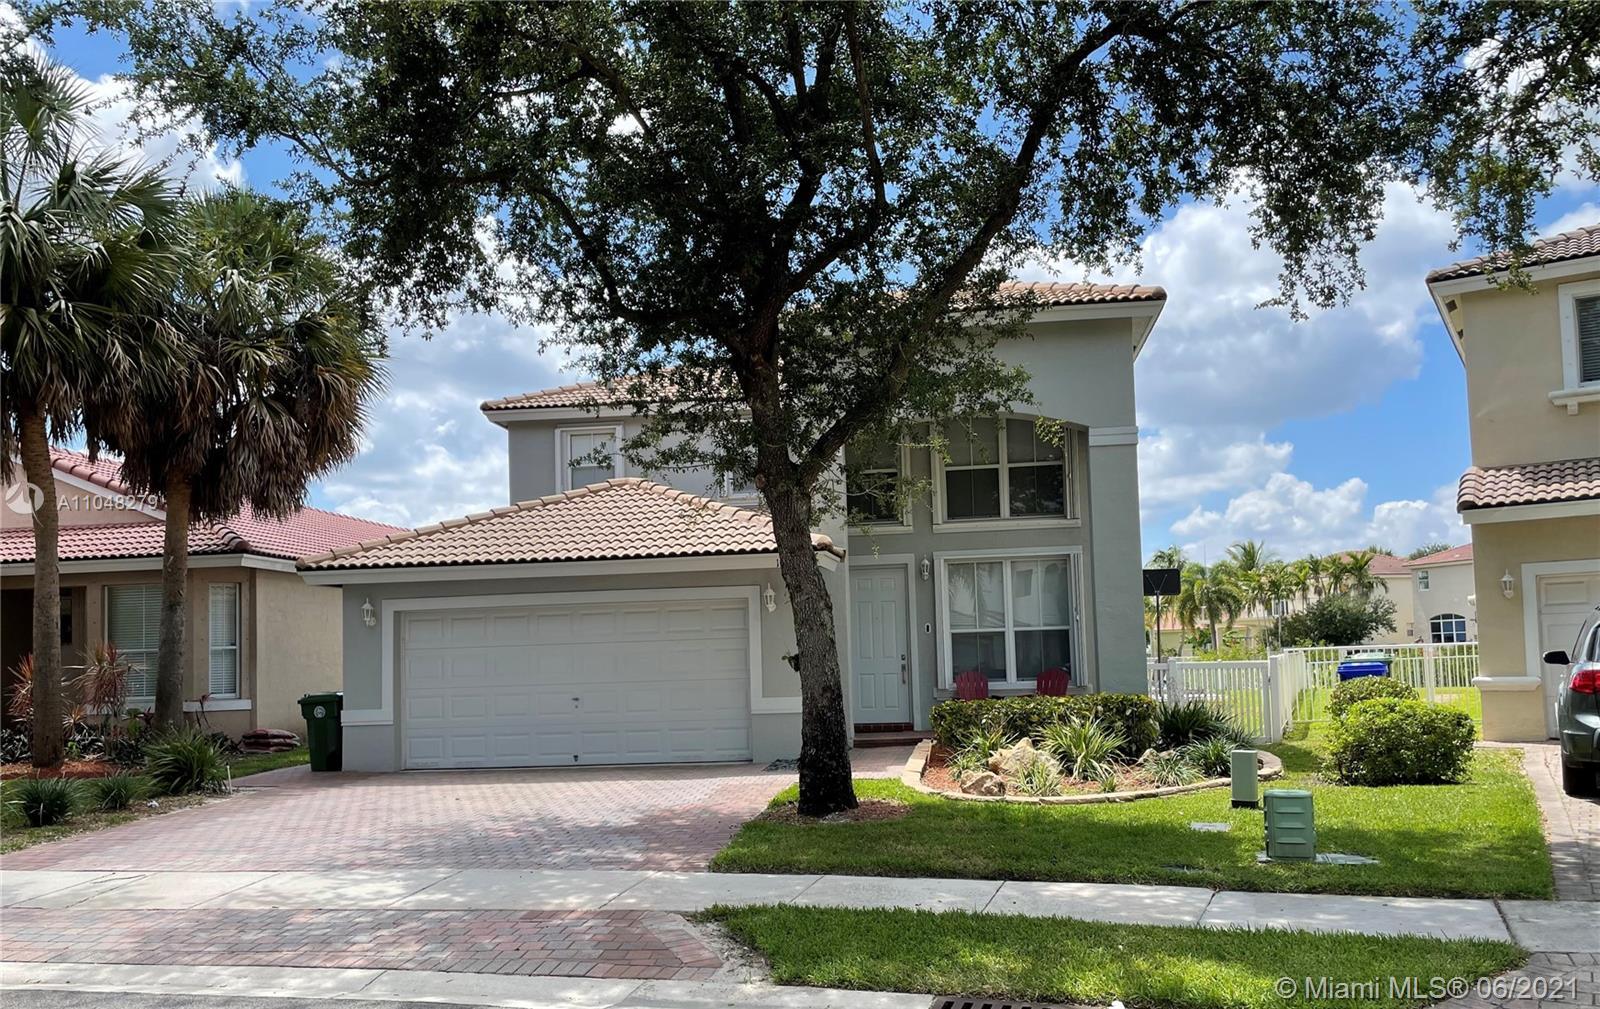 Walnut Creek - 1850 NW 78th Ave, Pembroke Pines, FL 33024